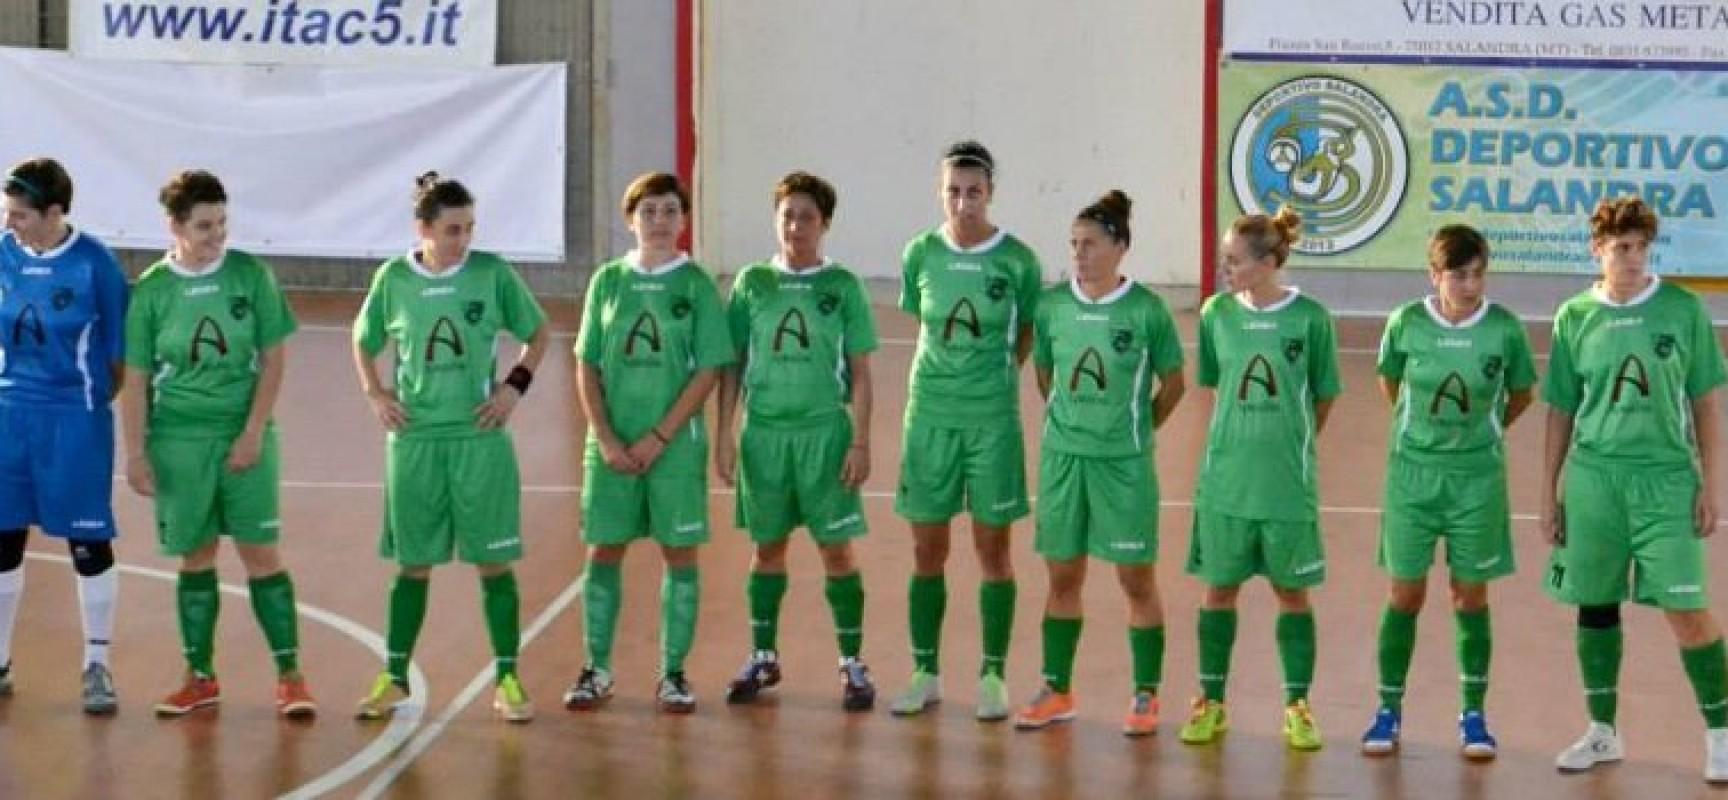 Arcadia sbanca Siracusa, 4-0 rifilato a Le Formiche